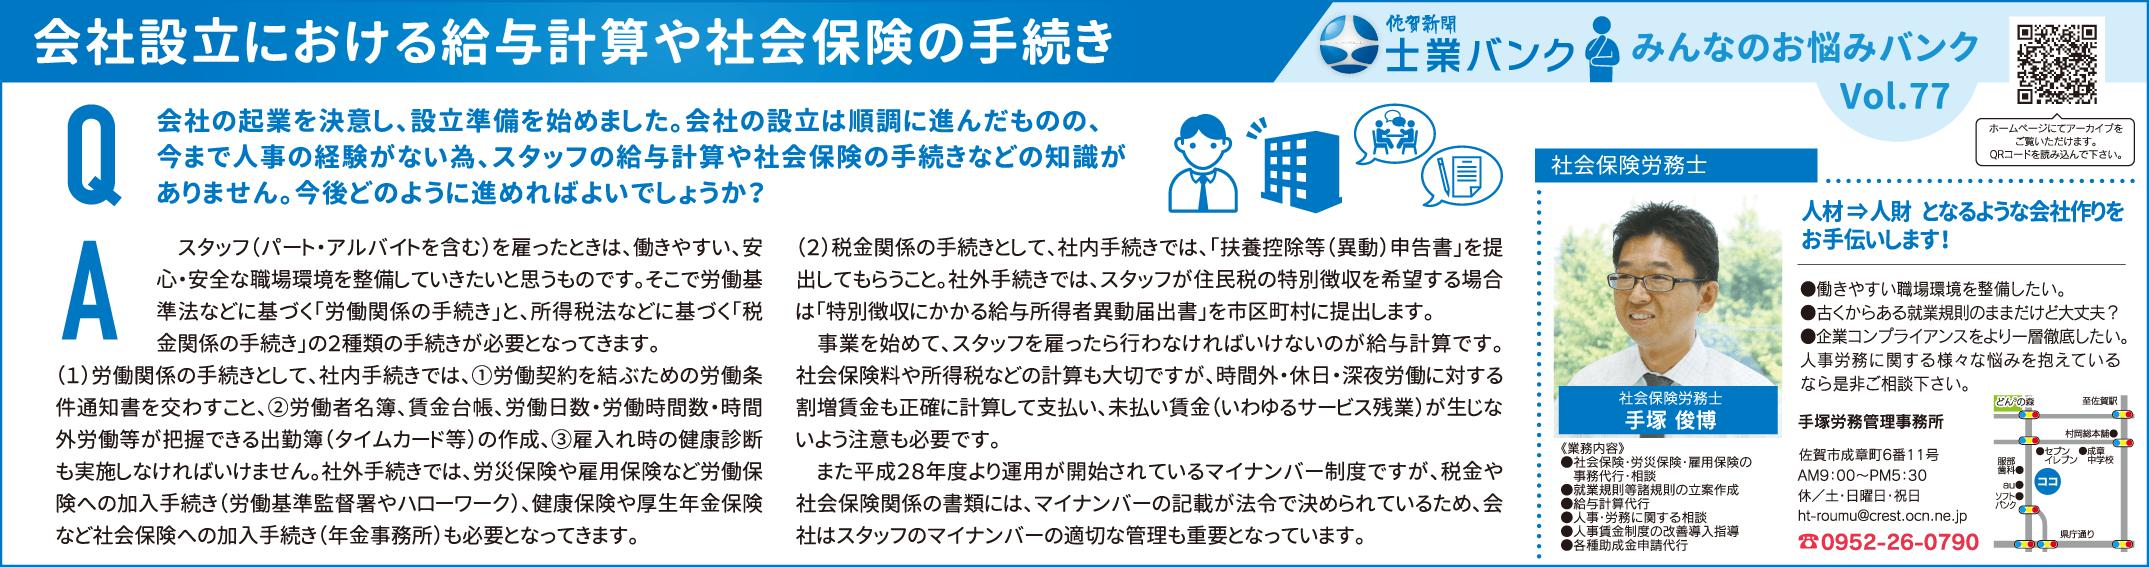 県 事務 佐賀 所 税